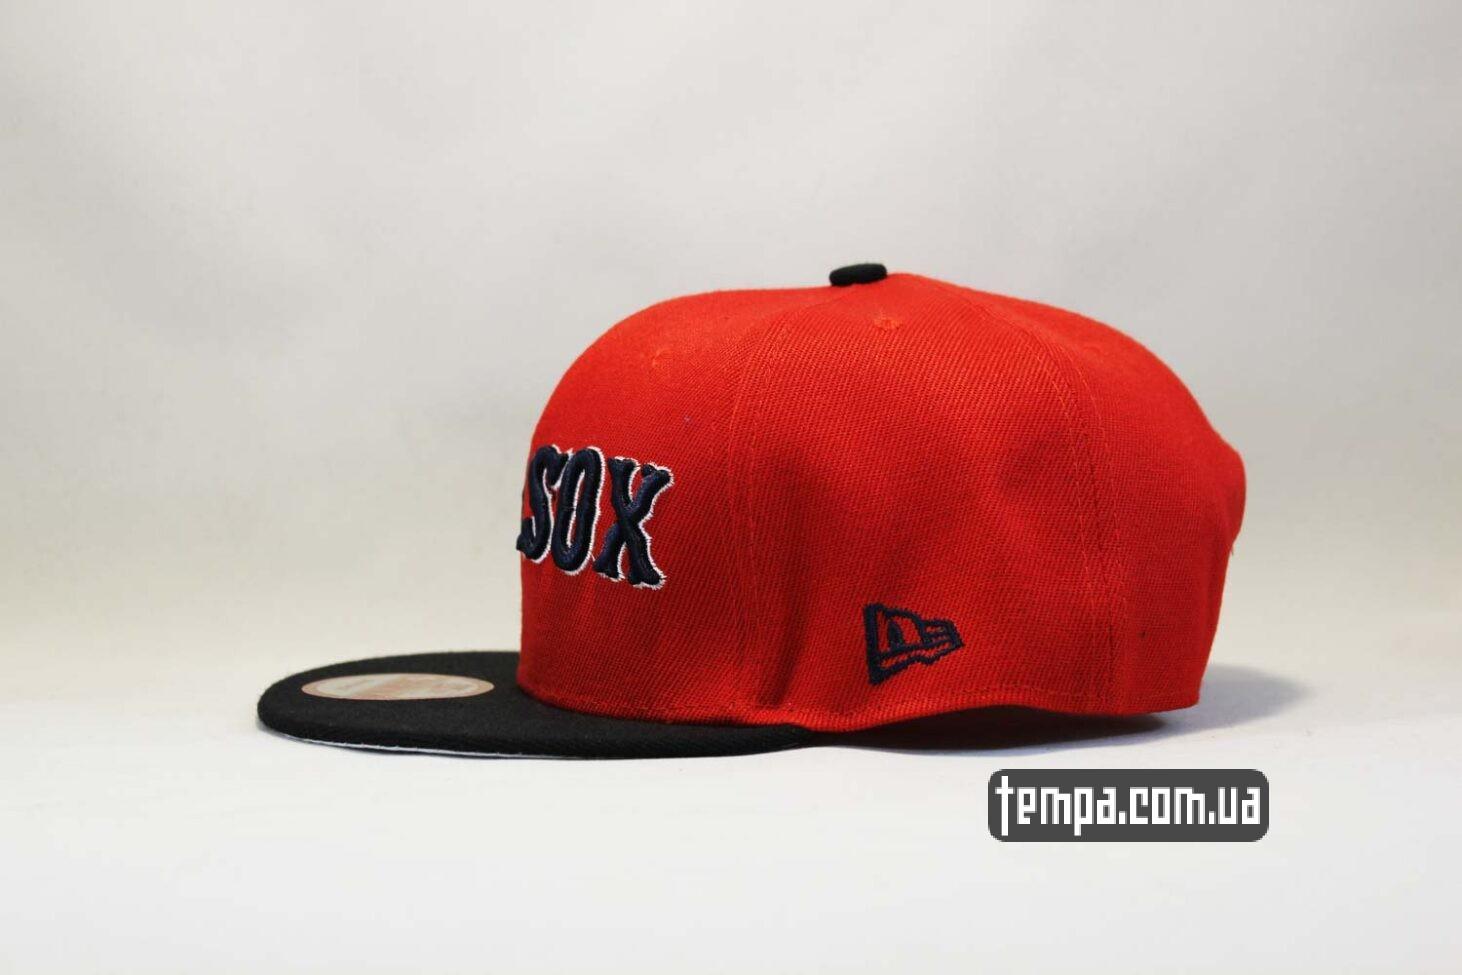 ред сокс бейсболка кепка snapback красная New Era RED SOX оригинал 9fifty